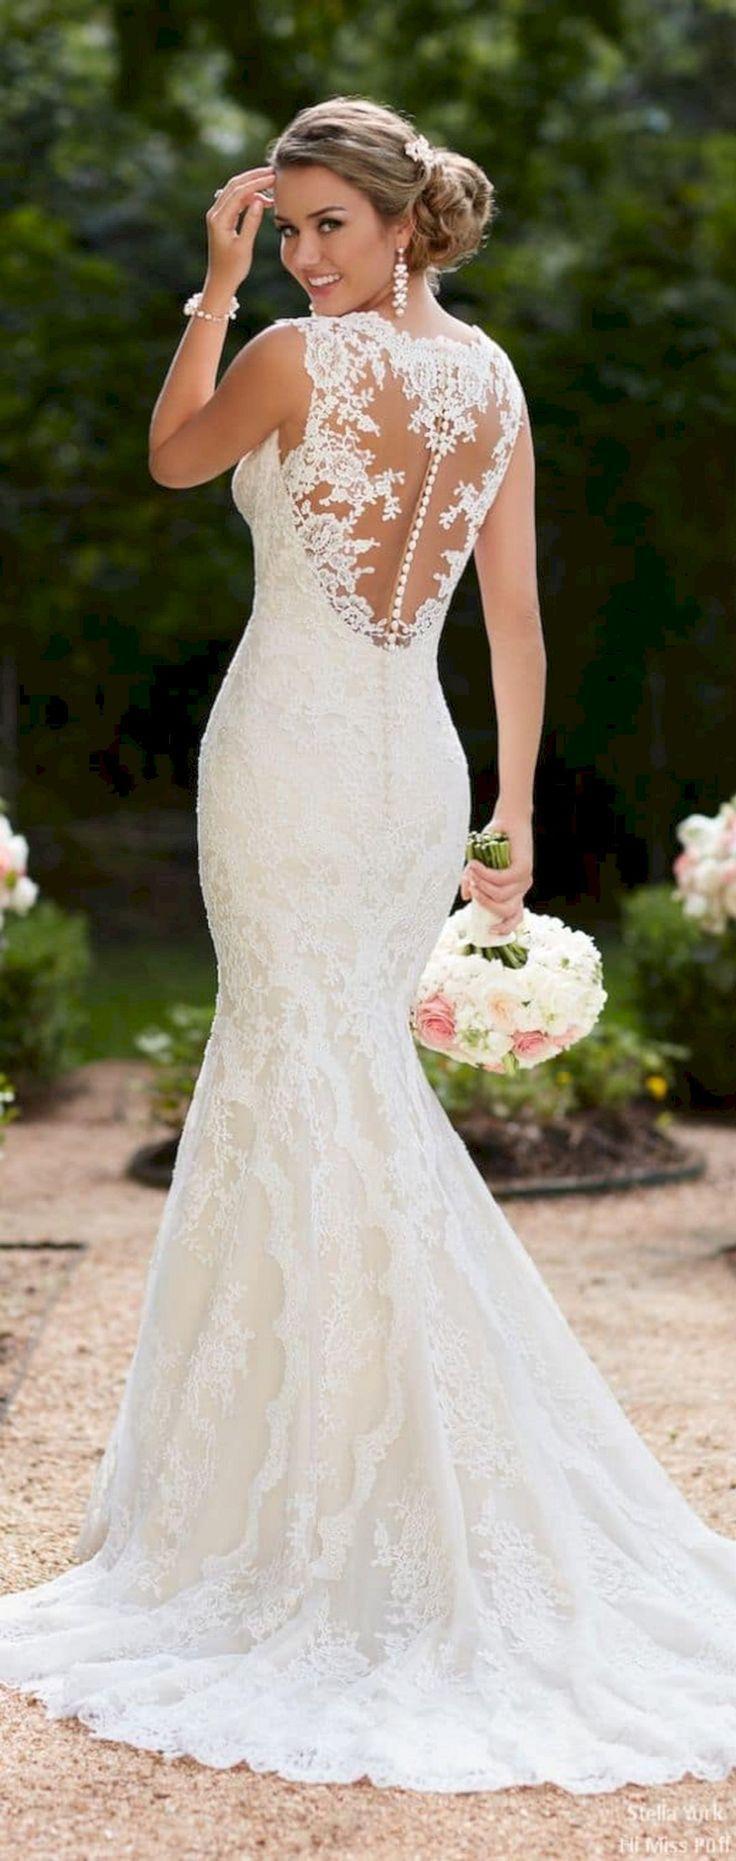 Mariage - 45  Beautiful White Lace Wedding Dress Open Back Ideas